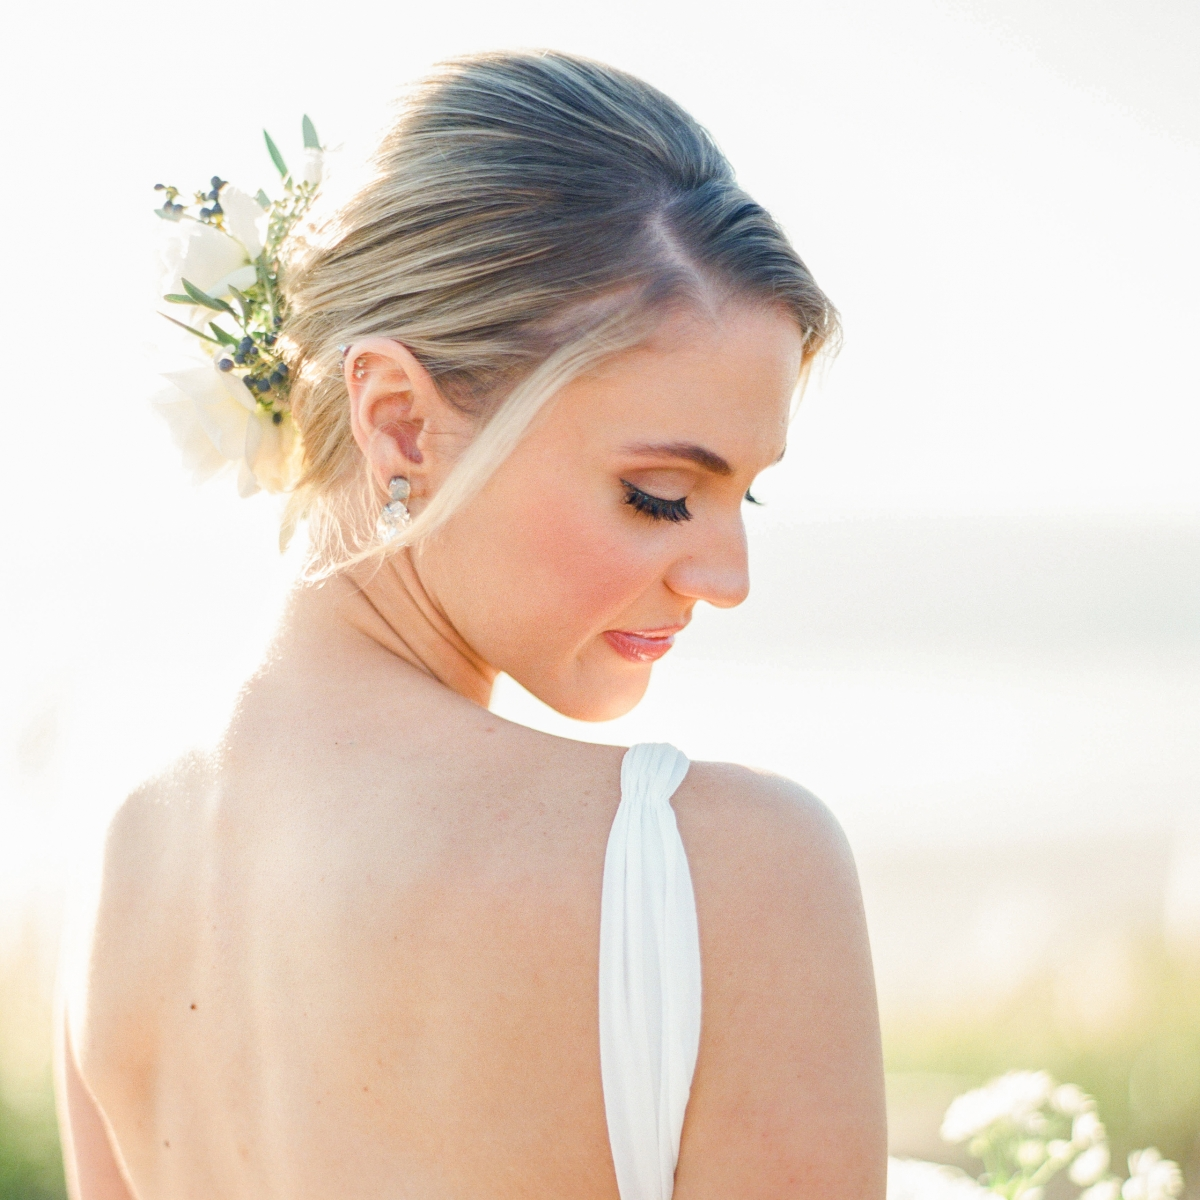 bay area wedding hair and makeup